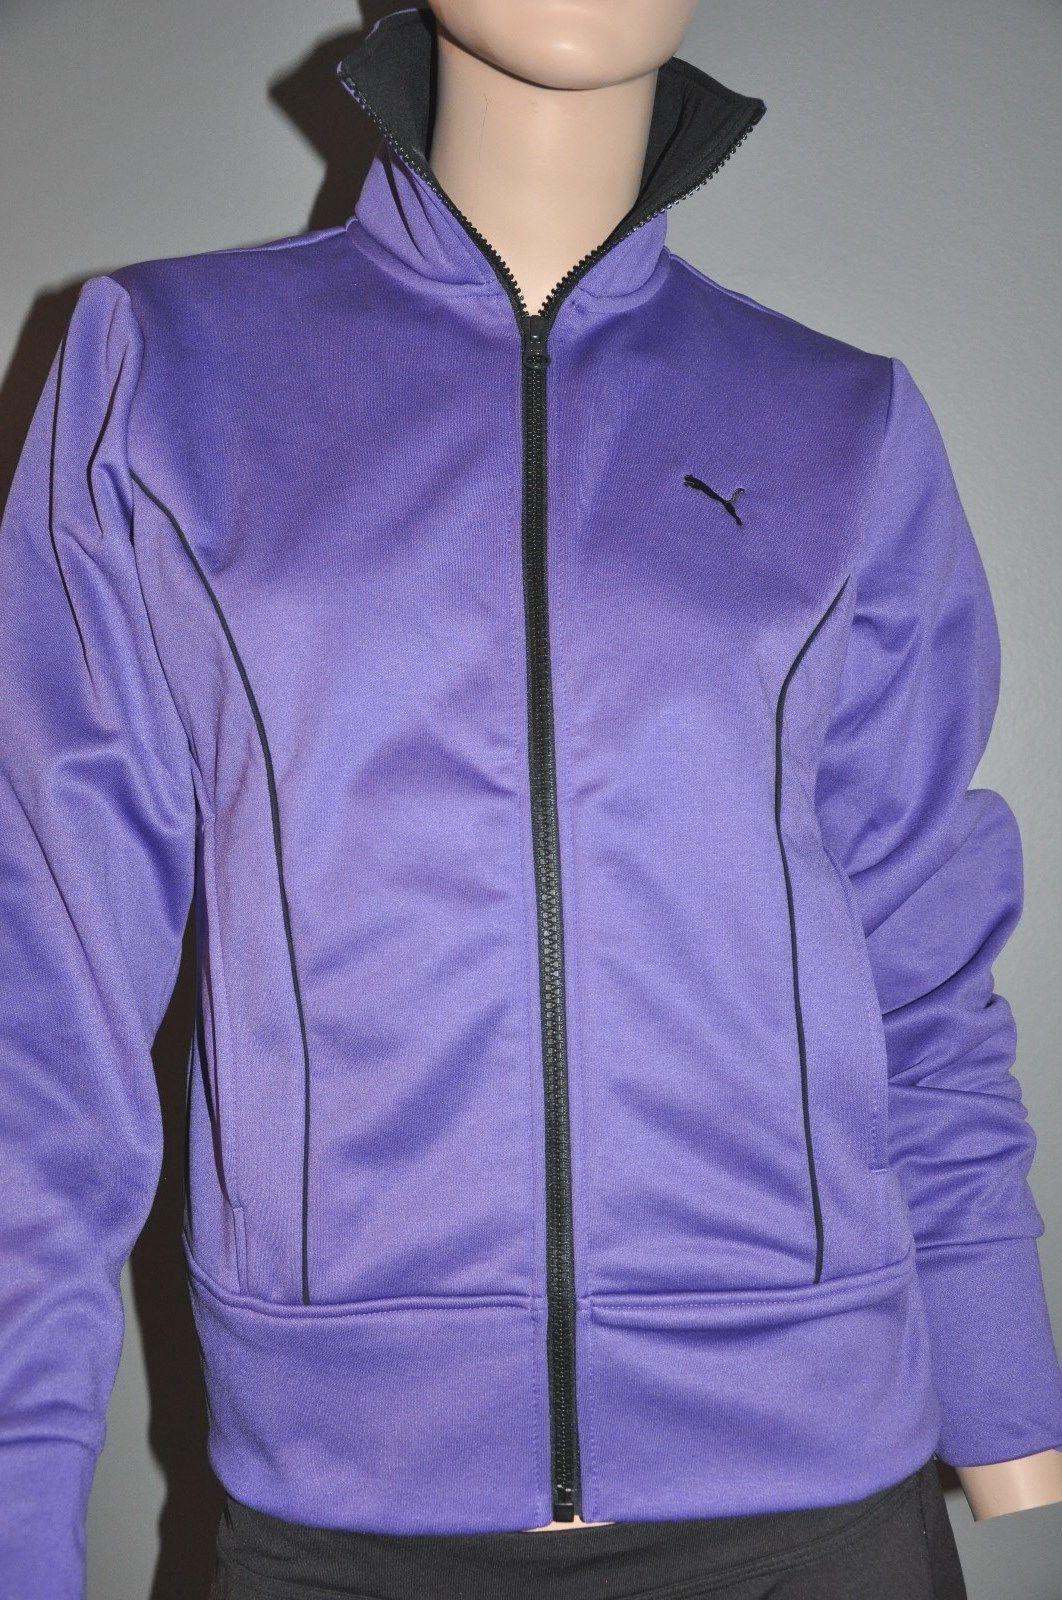 Puma womenus poly fleece jacket xssultra violetmsrp